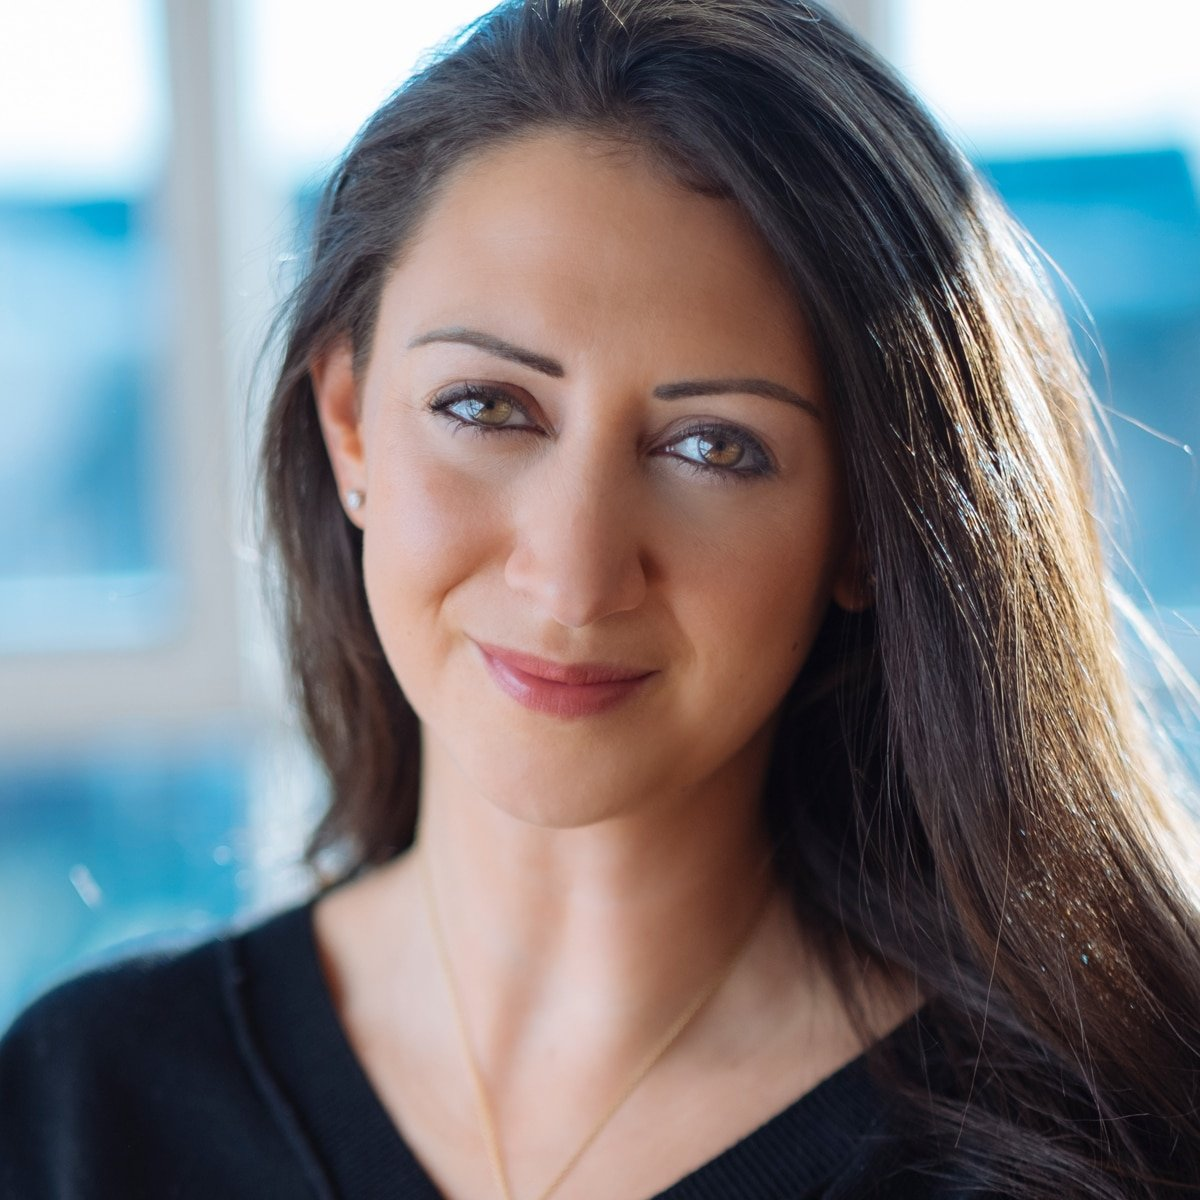 Lauren-Vaknine-diet-healthy-easting-speaker-expert-campaigner-influencer-at-Great-British-Speakers